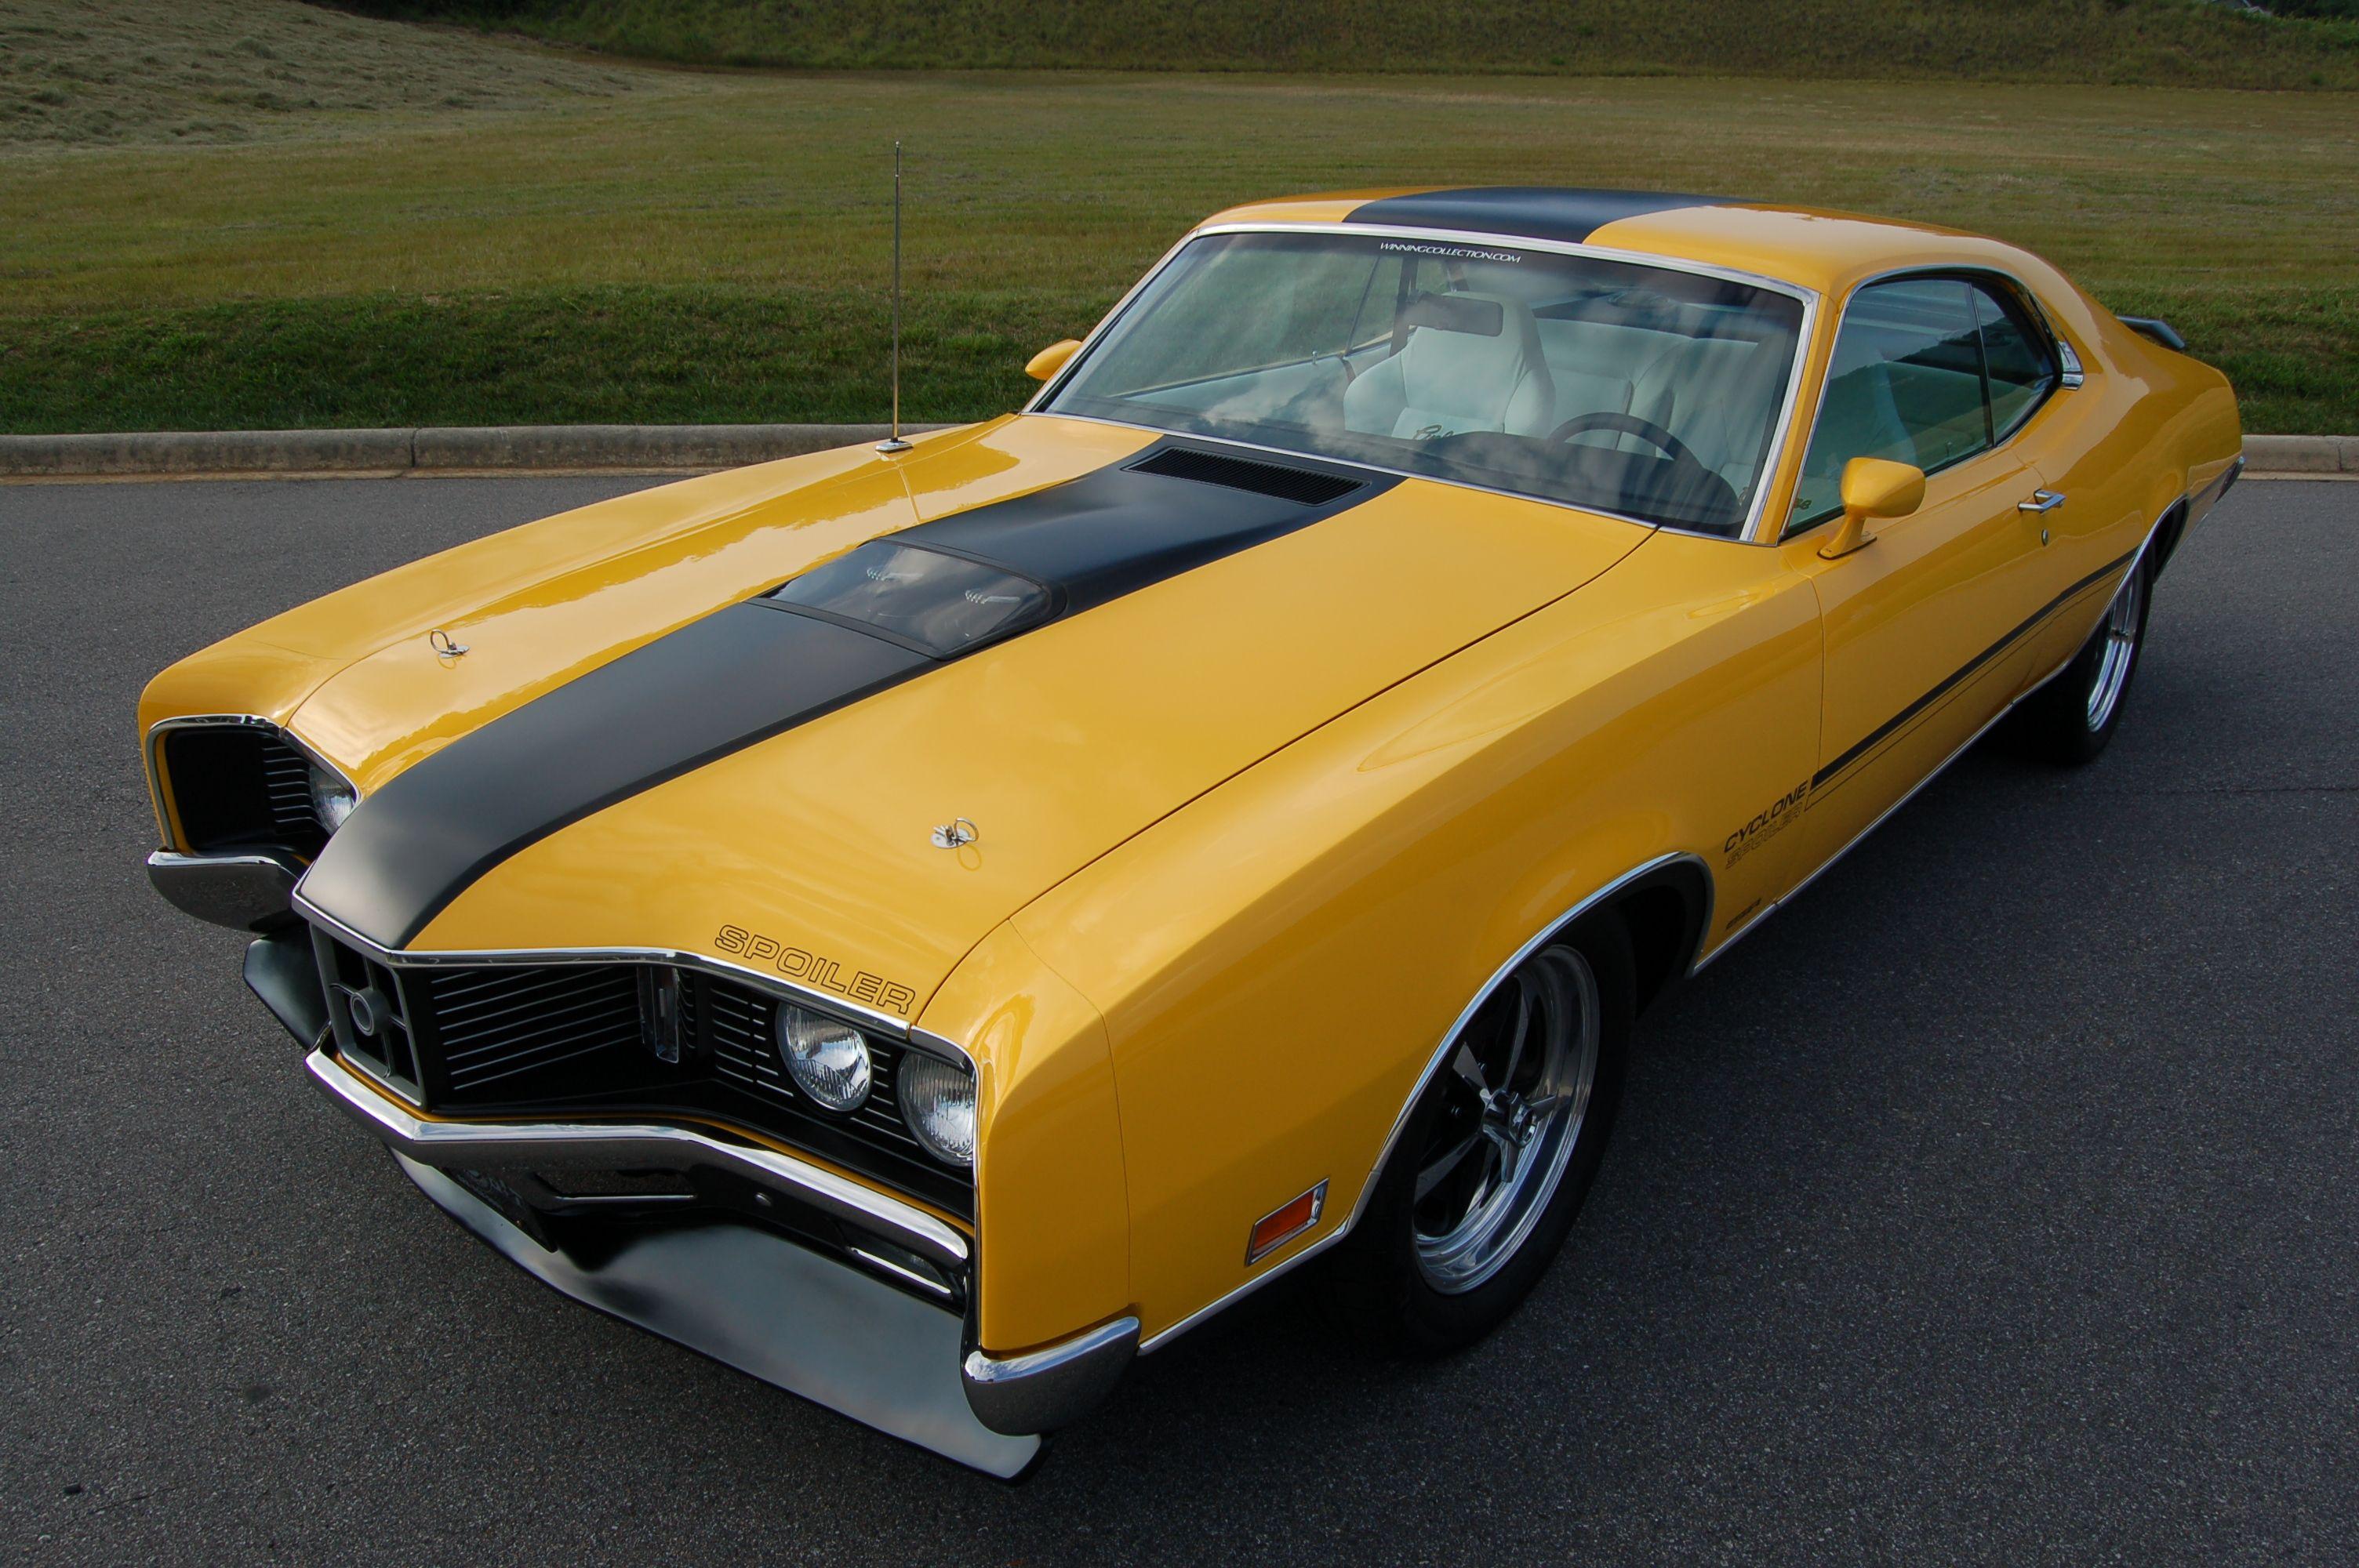 1970 Mercury Cyclone, Yellow & Black. Restoration, Resto